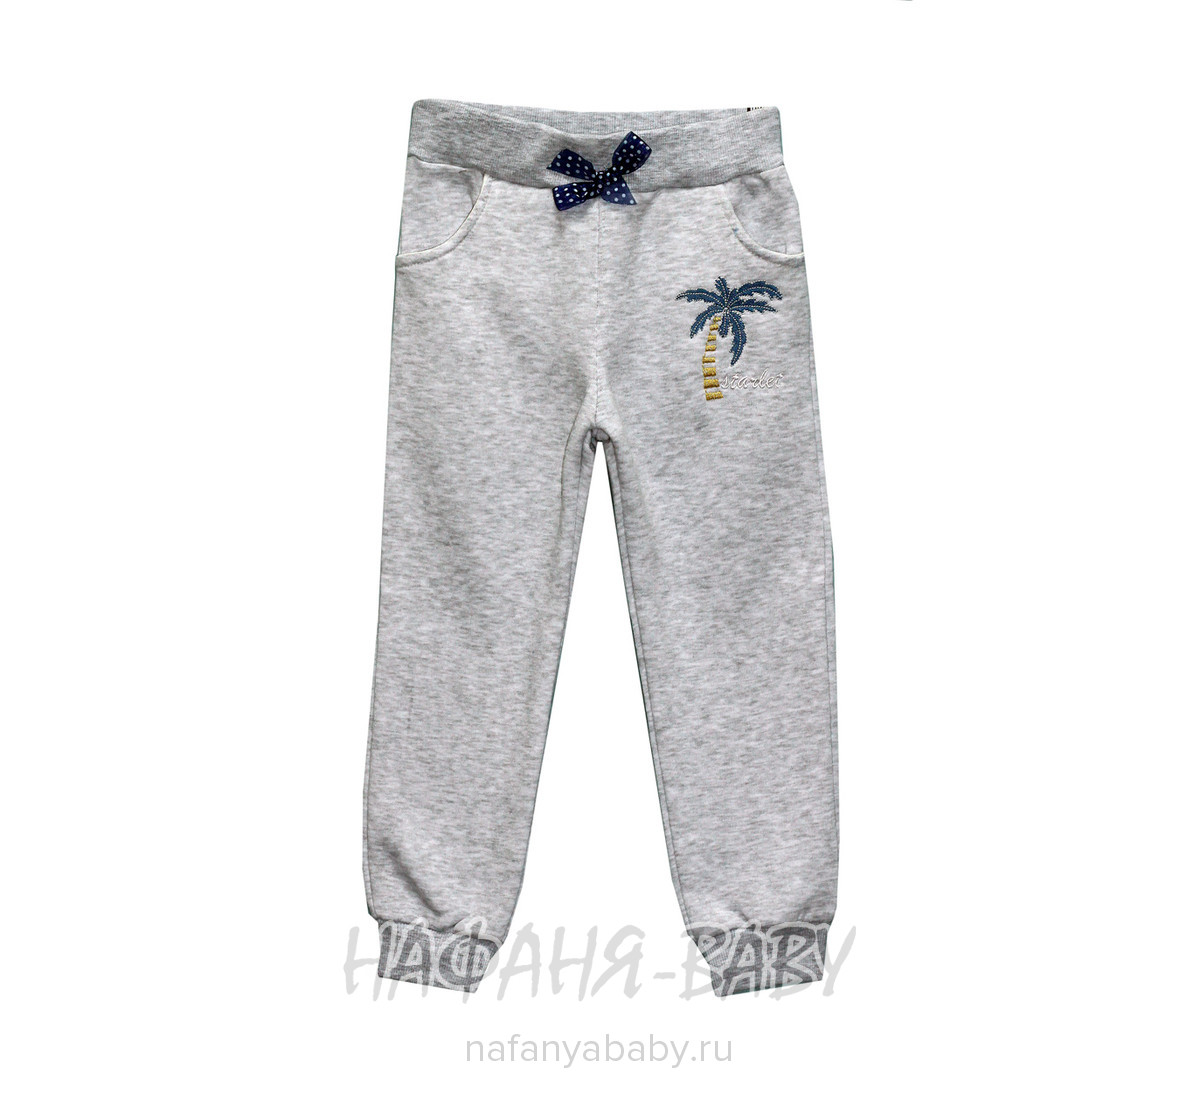 Детские брюки MINIWORLD арт: 3842, 5-9 лет, оптом Турция